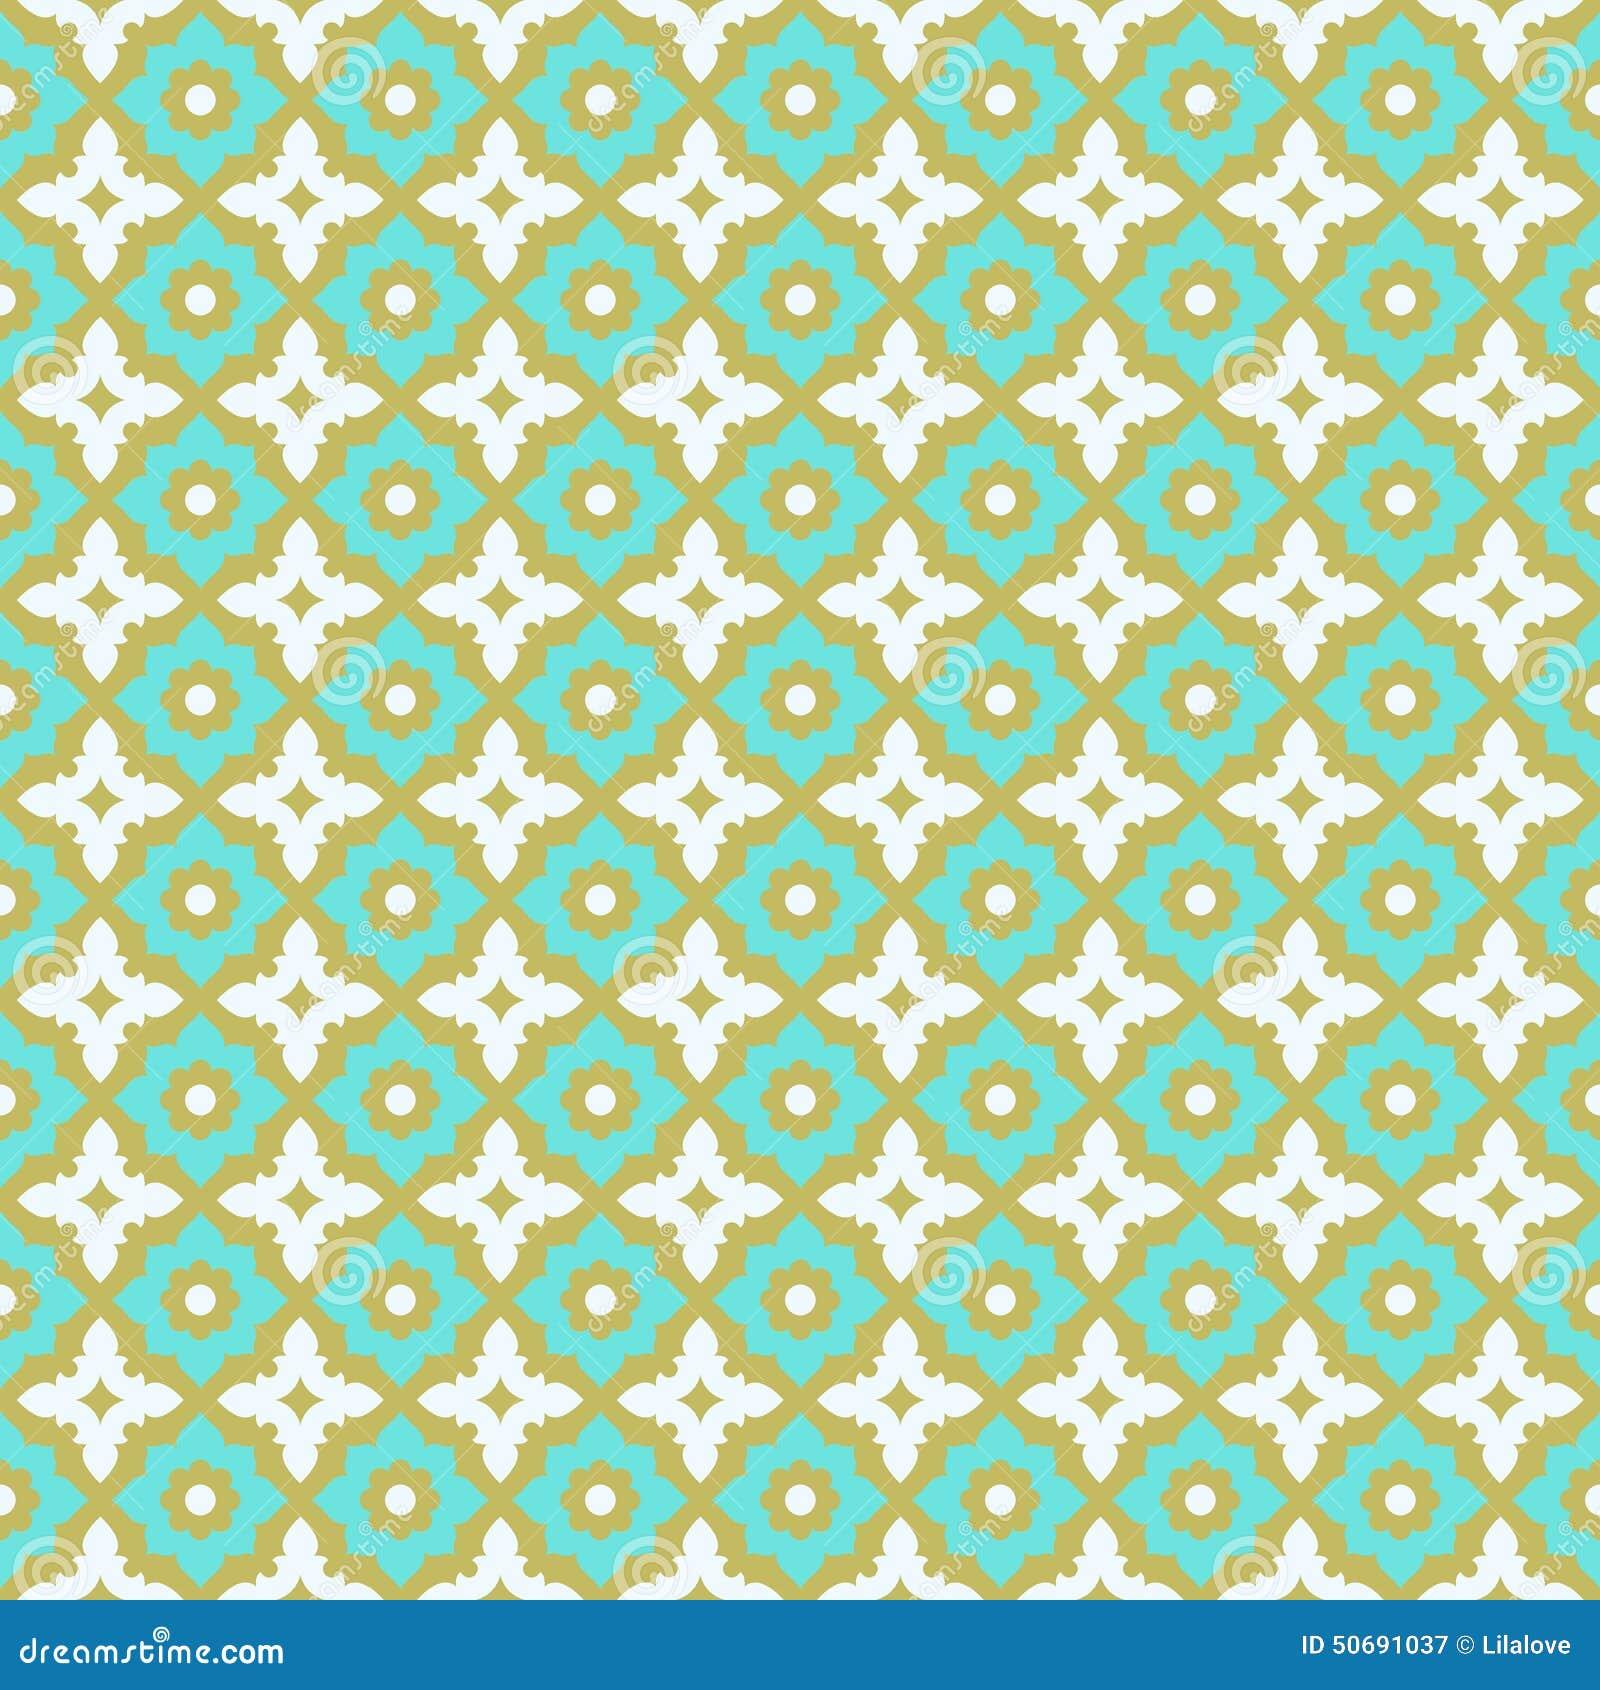 Seamless Pattern Ceramic Tile Design Stock Vector - Image: 50691037